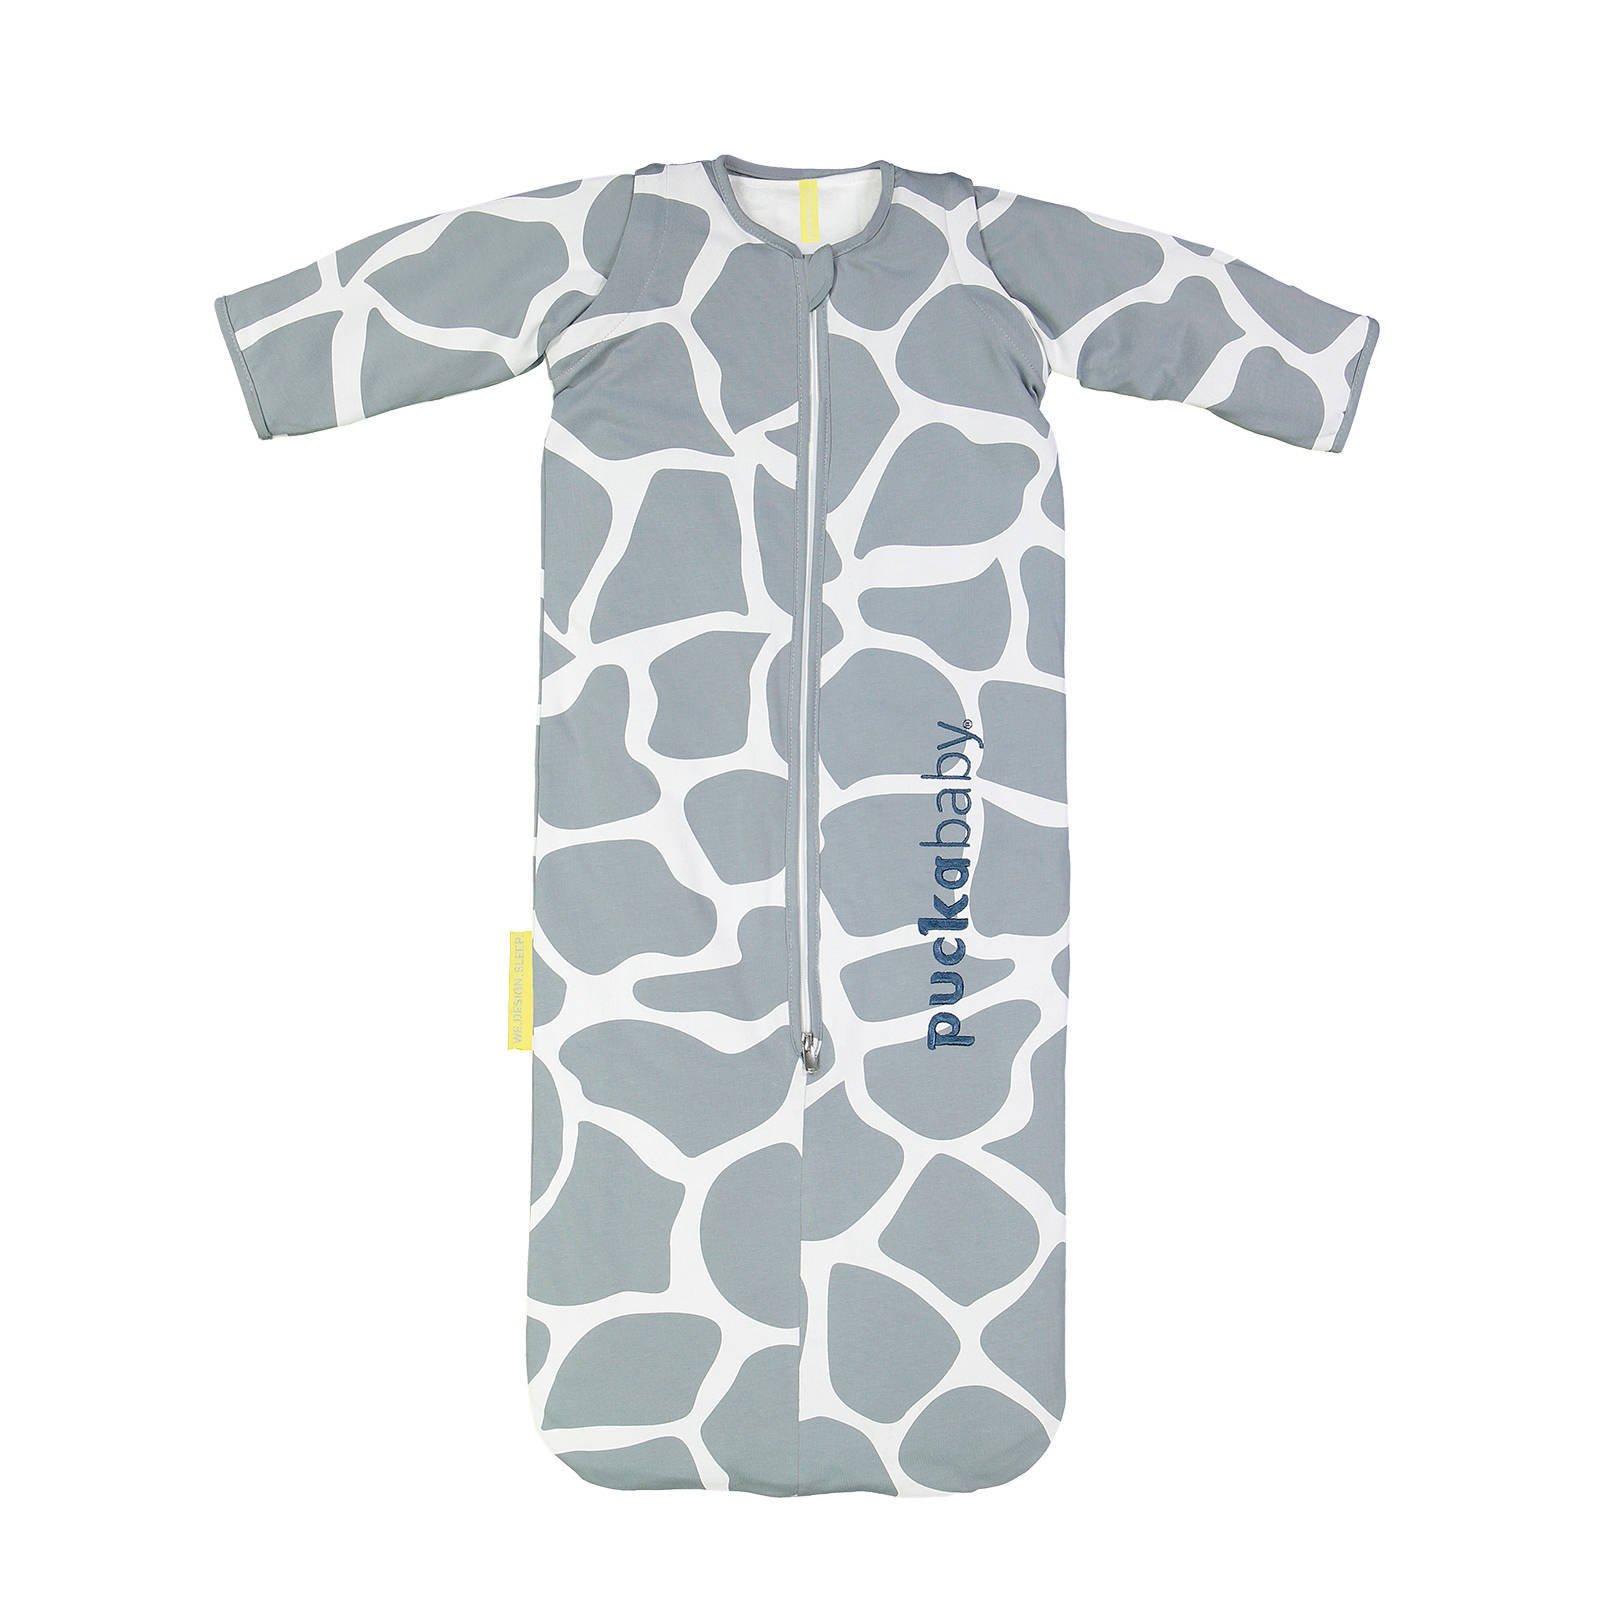 Puckababy Bag 4 Seasons - Giraph Sky